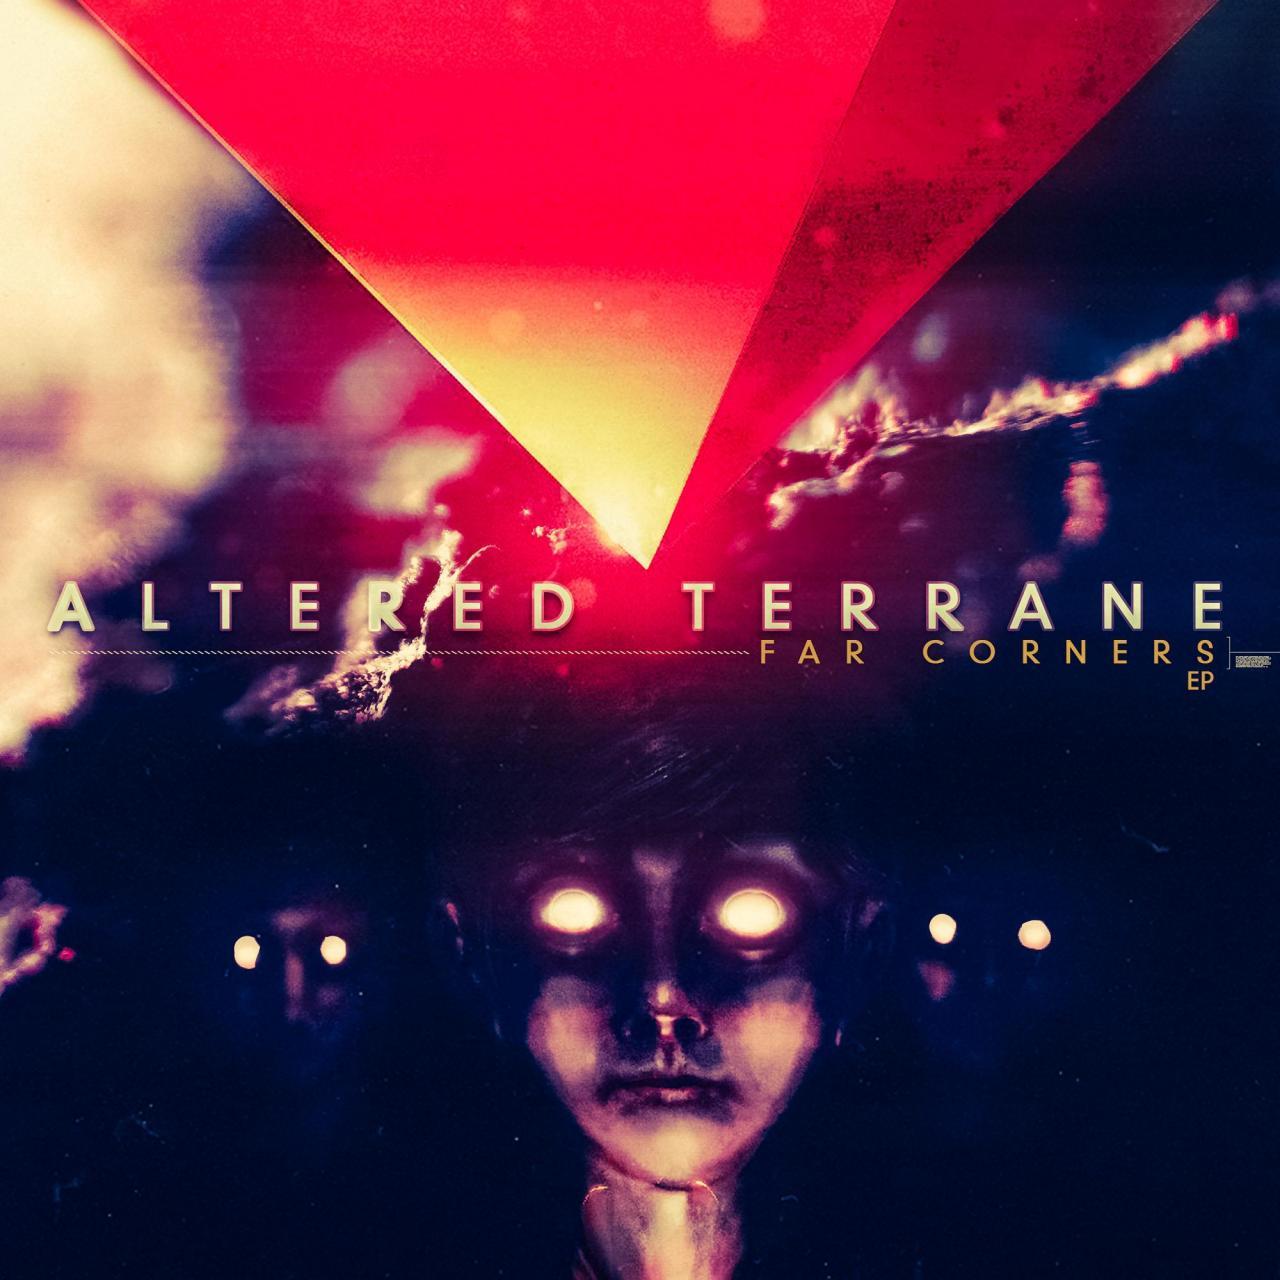 Altered Terrane - Far Corners EP